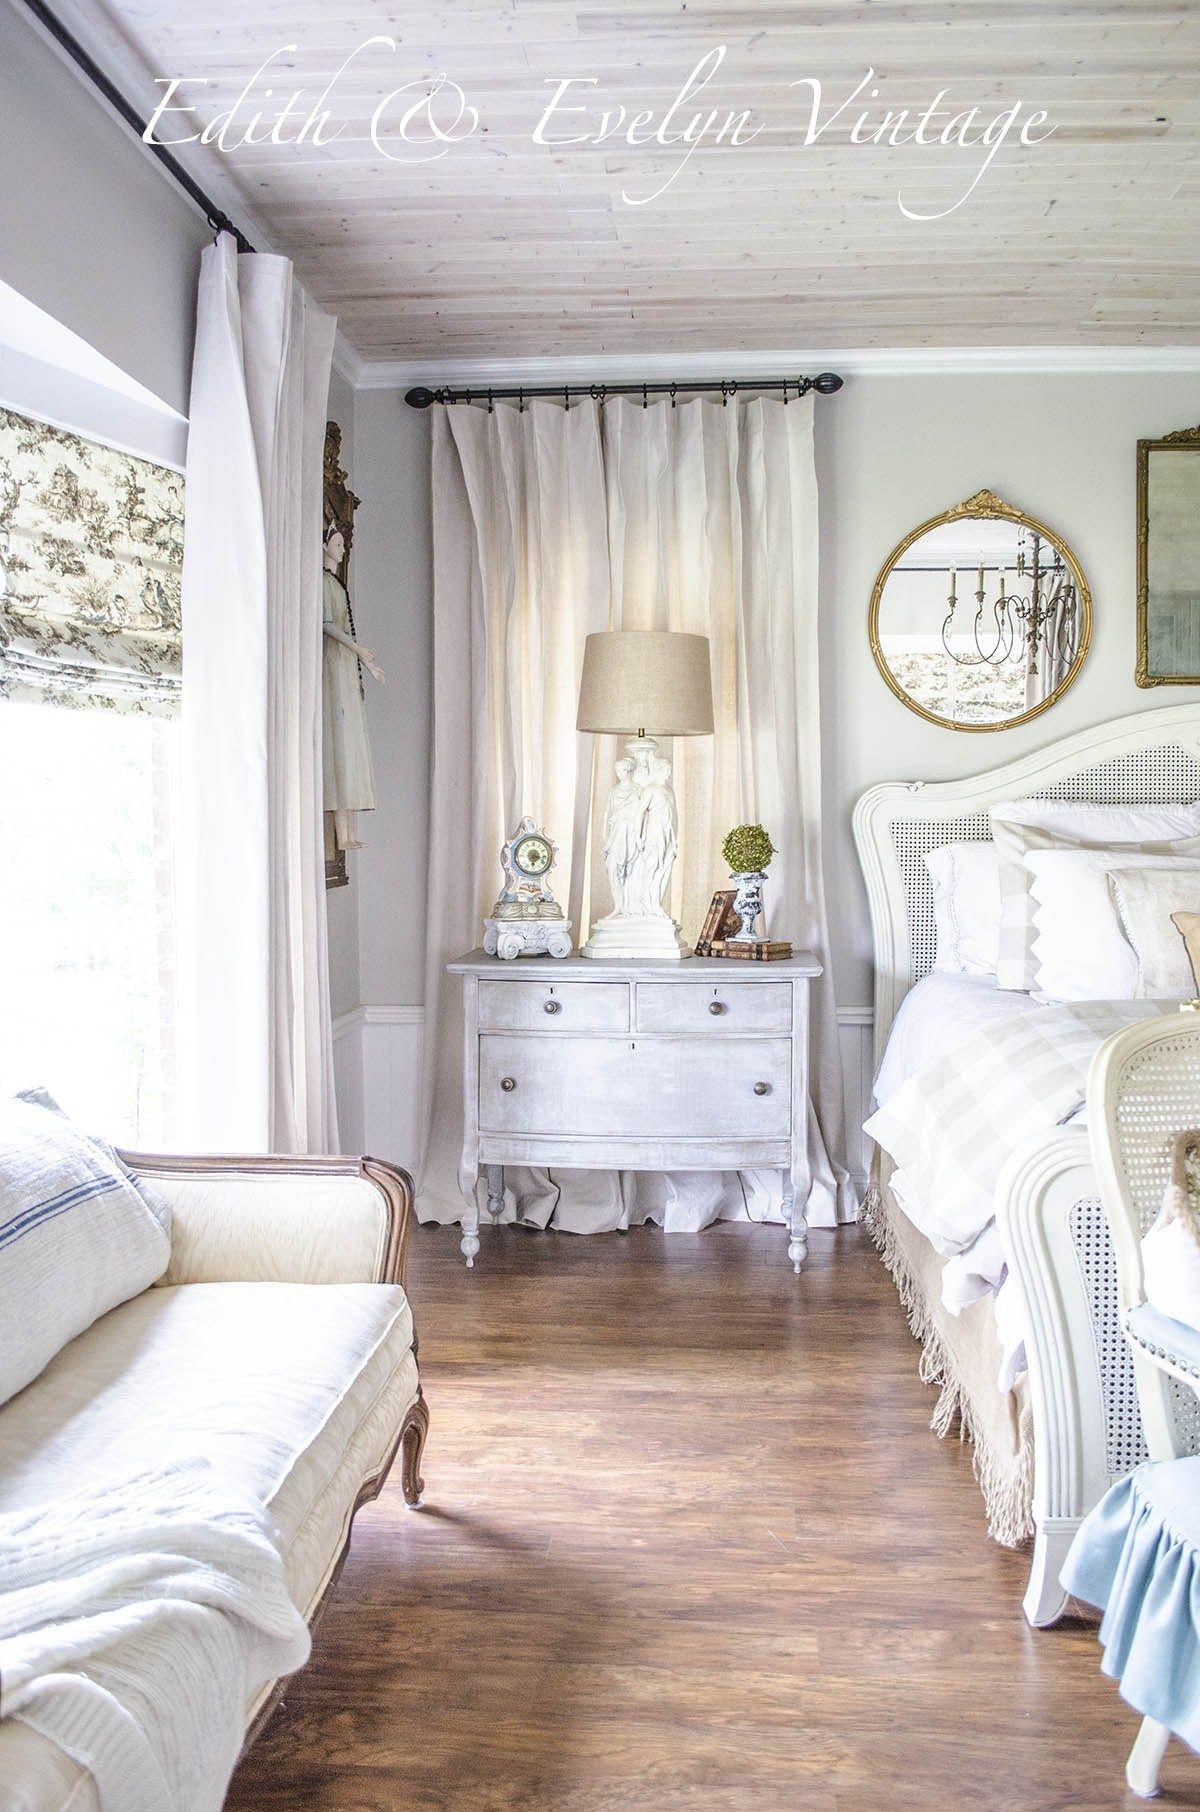 Vintage master bedroom decor  Transformation  Bedroom decor  Pinterest  Bedroom Master Bedroom